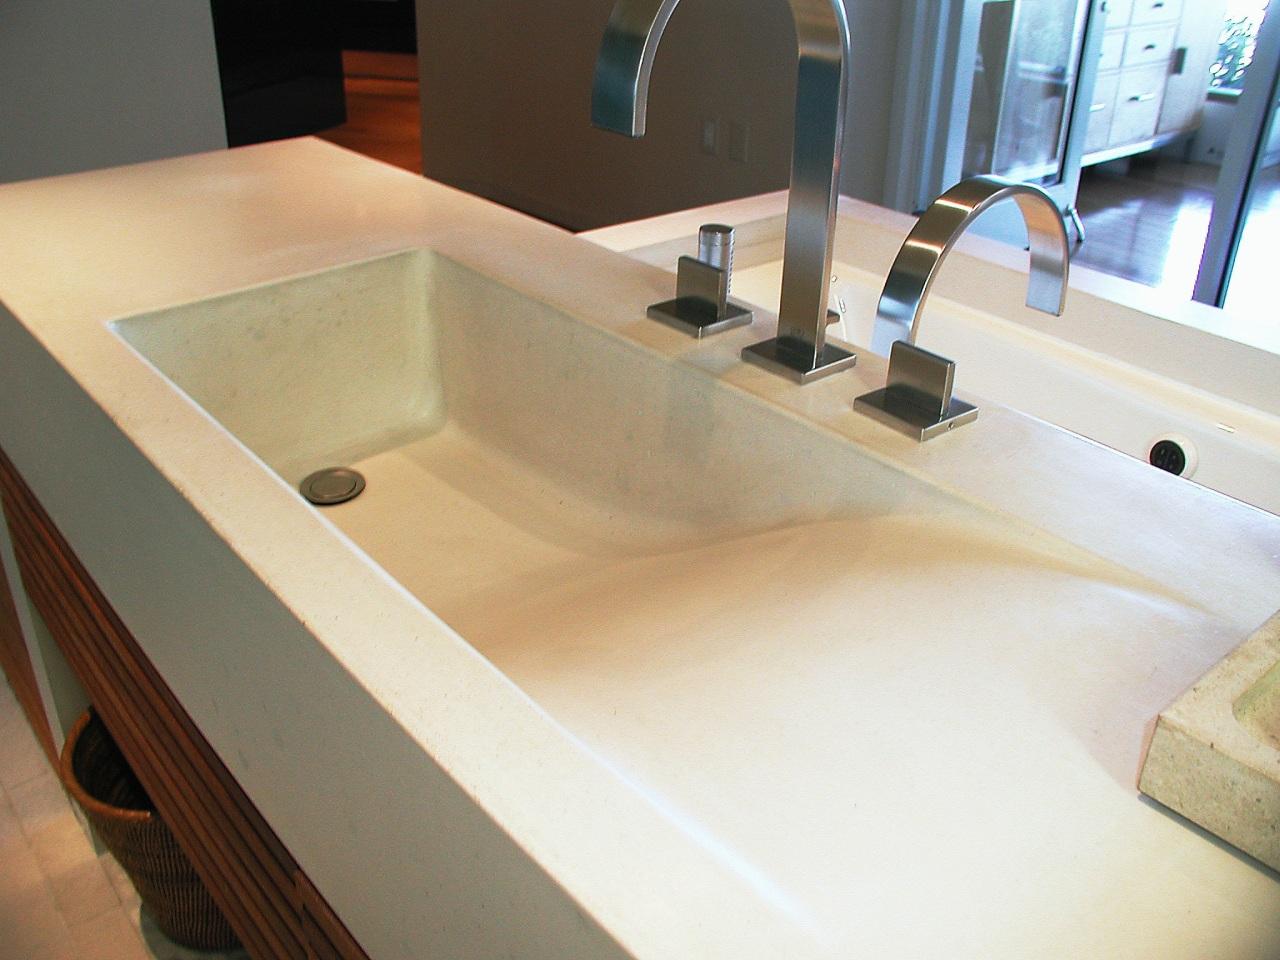 view of this contemporary concrete sink from Dex bathroom, bathroom sink, countertop, floor, plumbing fixture, product design, sink, tap, white